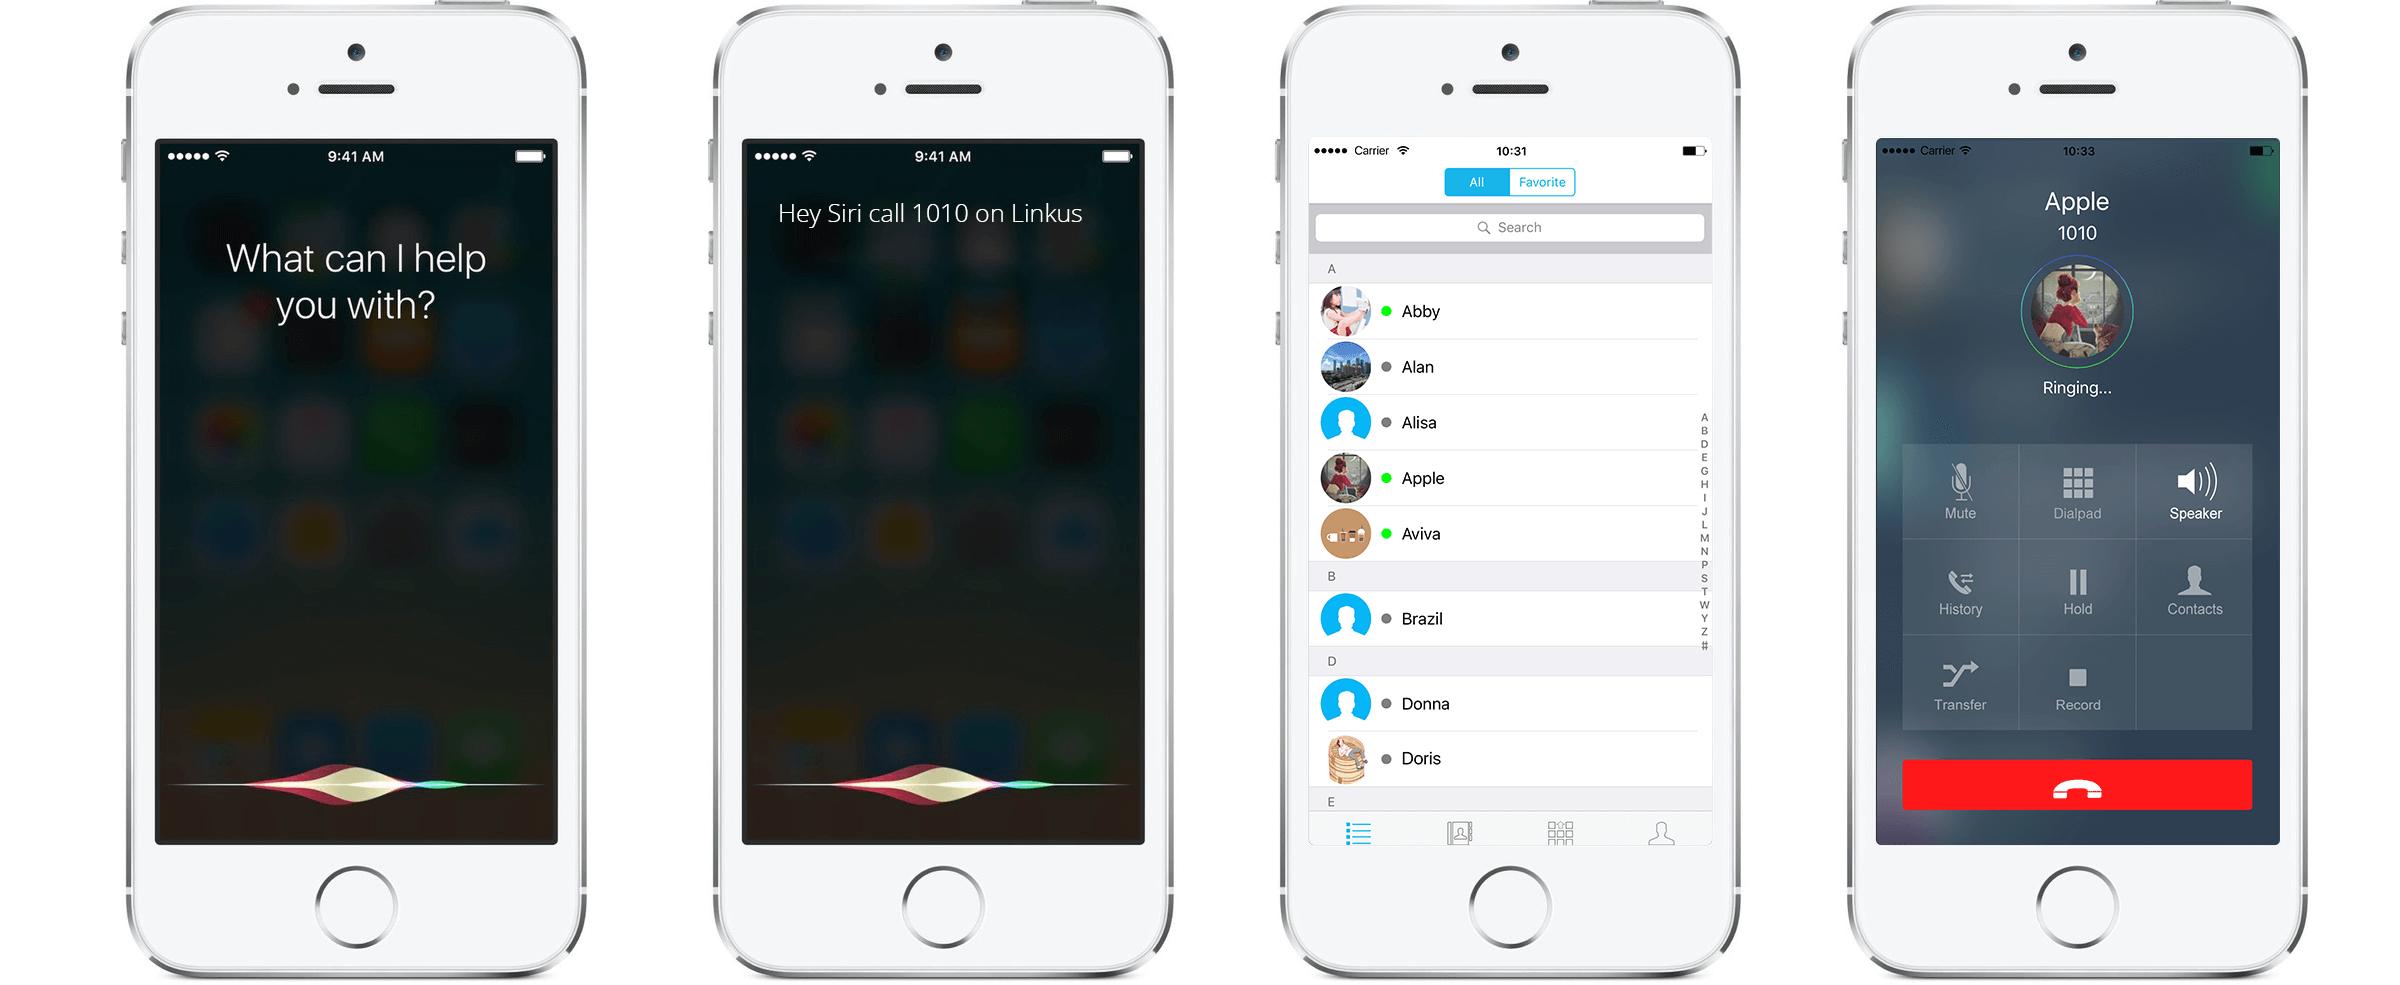 Make a Linkus Call via Siri